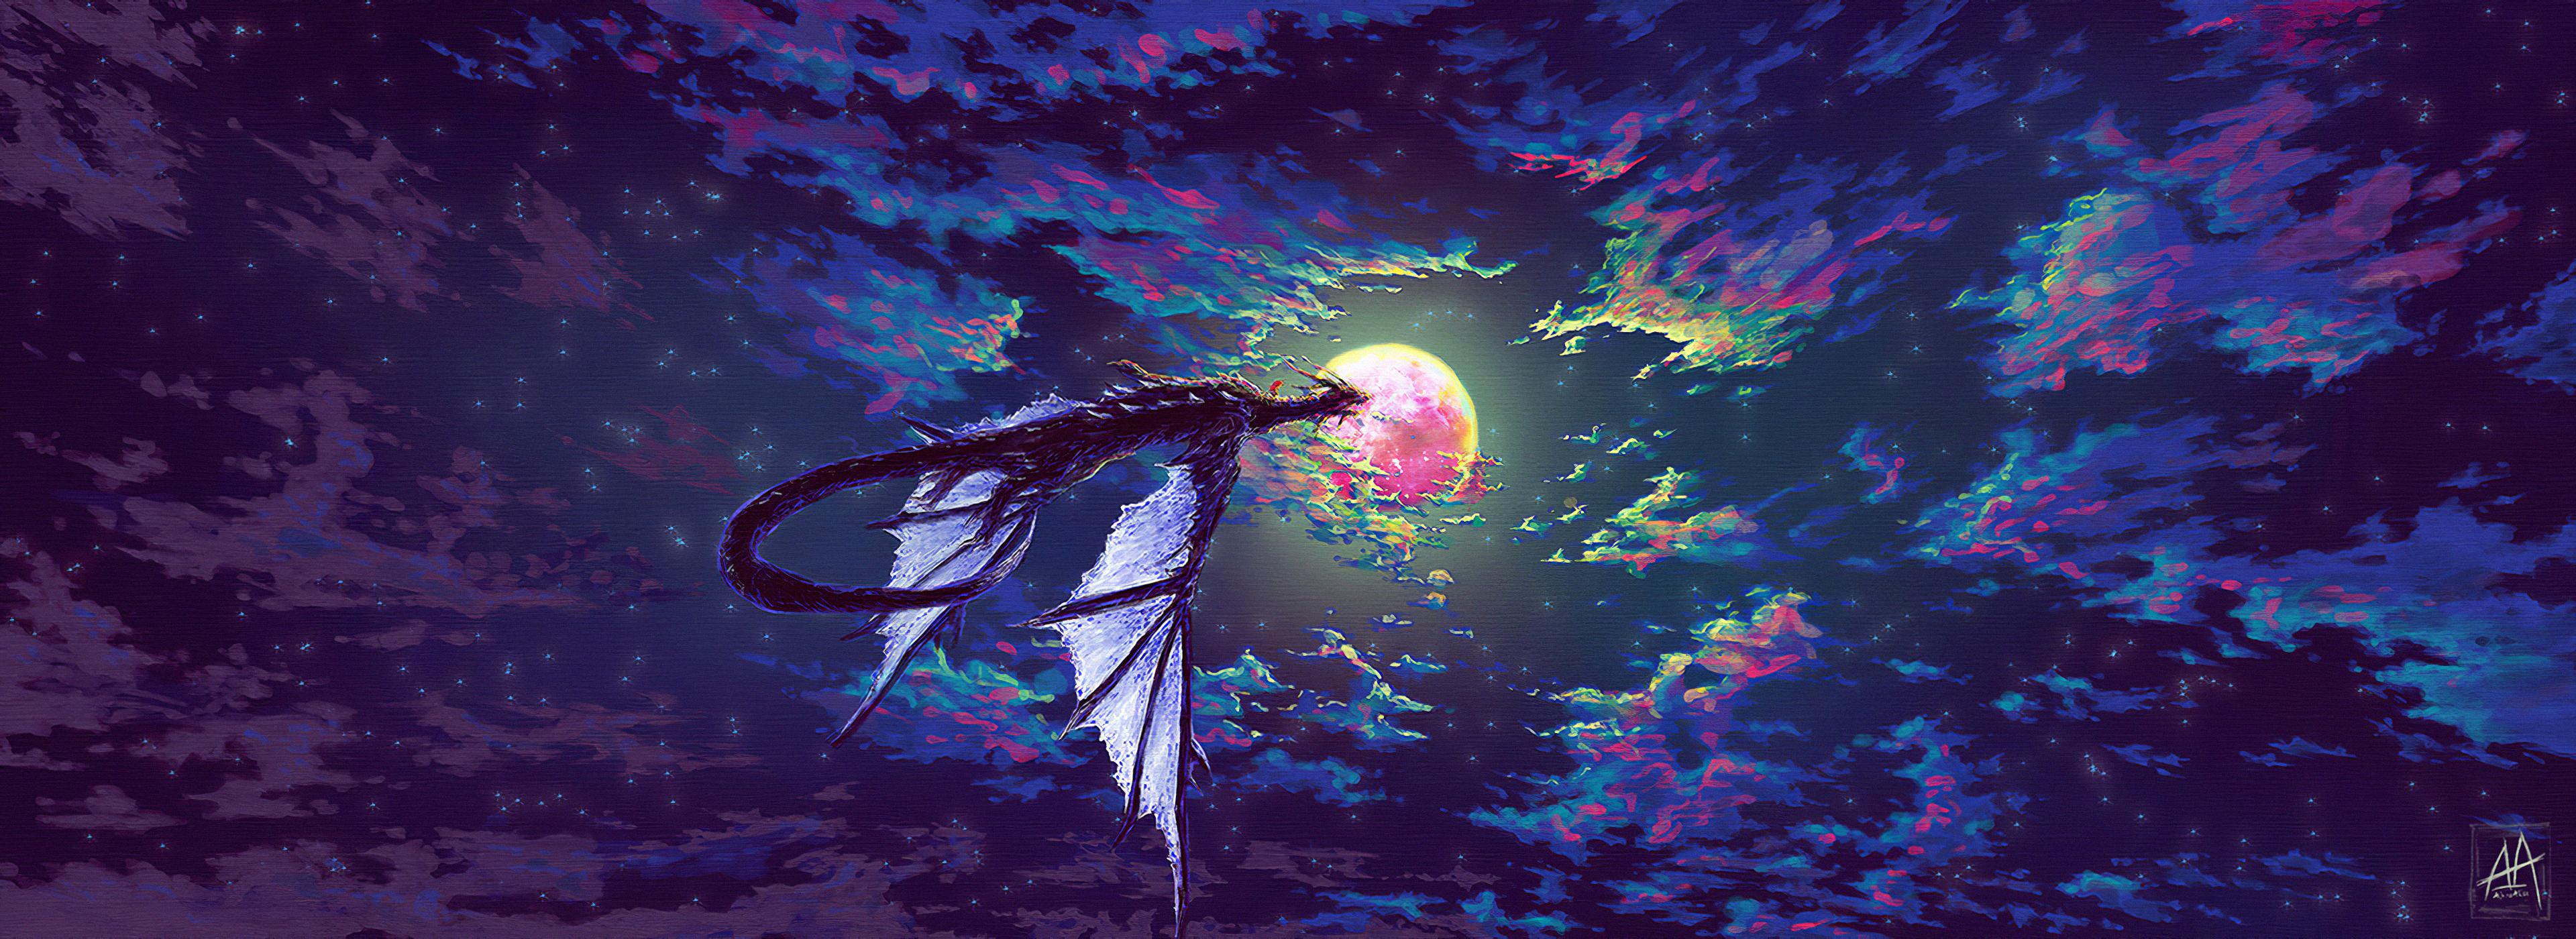 dragon towards parallel sky 1578254732 - Dragon Towards Parallel Sky -